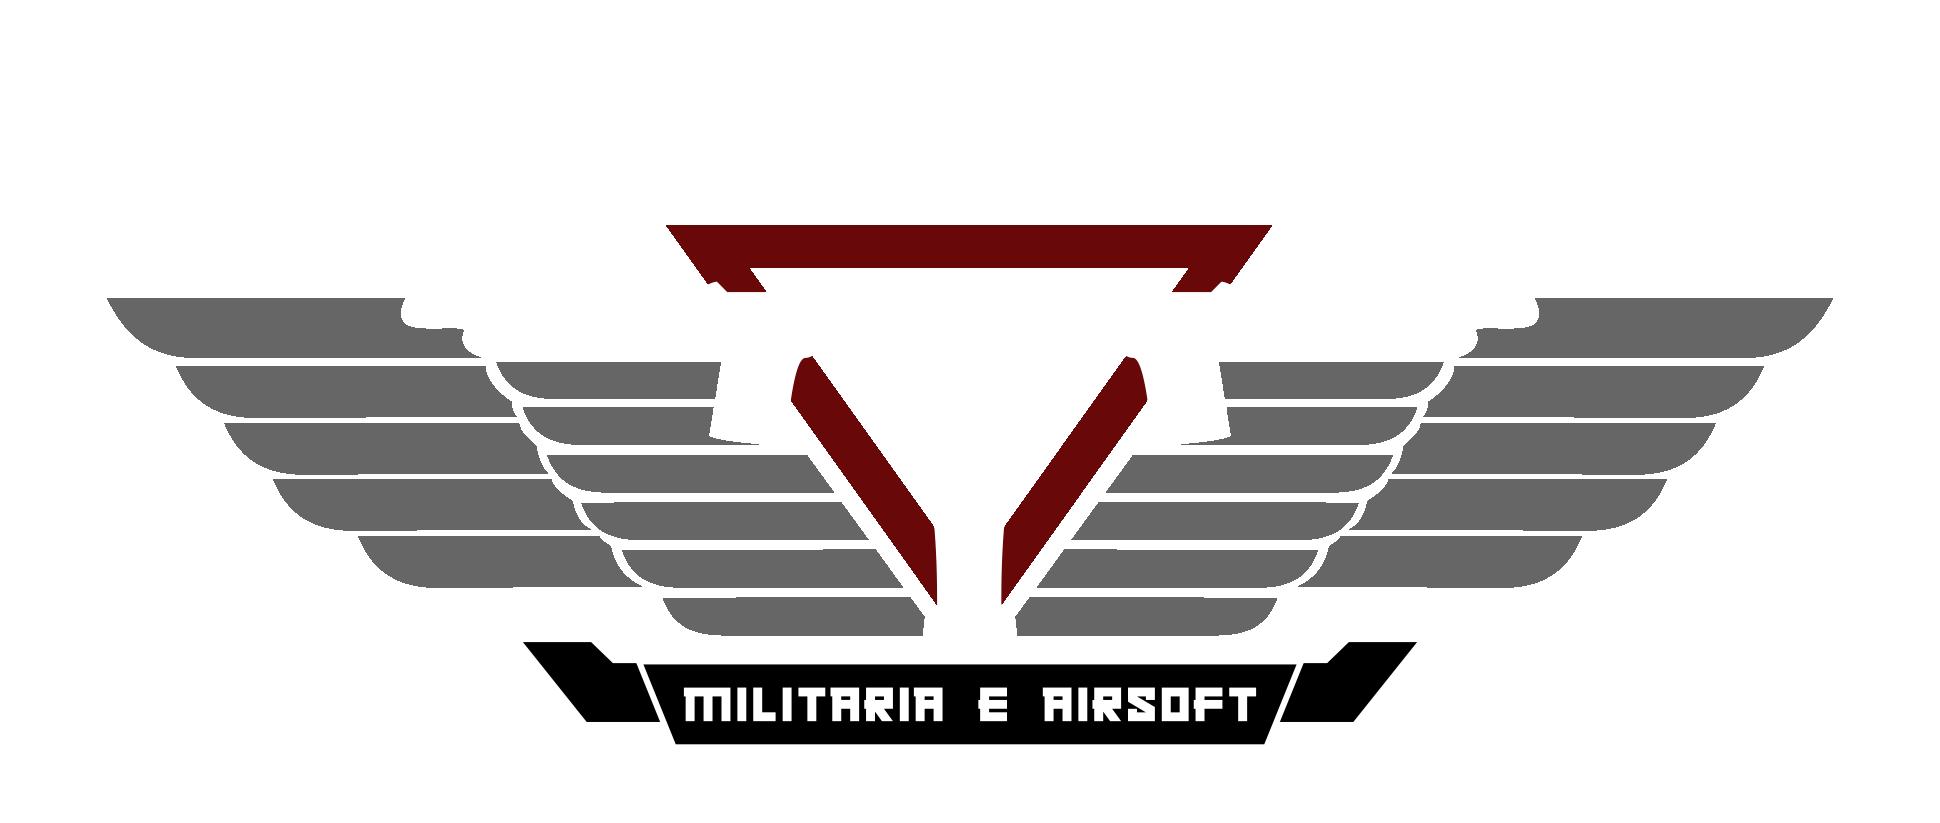 Óculos Tático Ess Crossbow Airsoft Militar - 3 Lentes - Tactical War ... 1b270e52ac